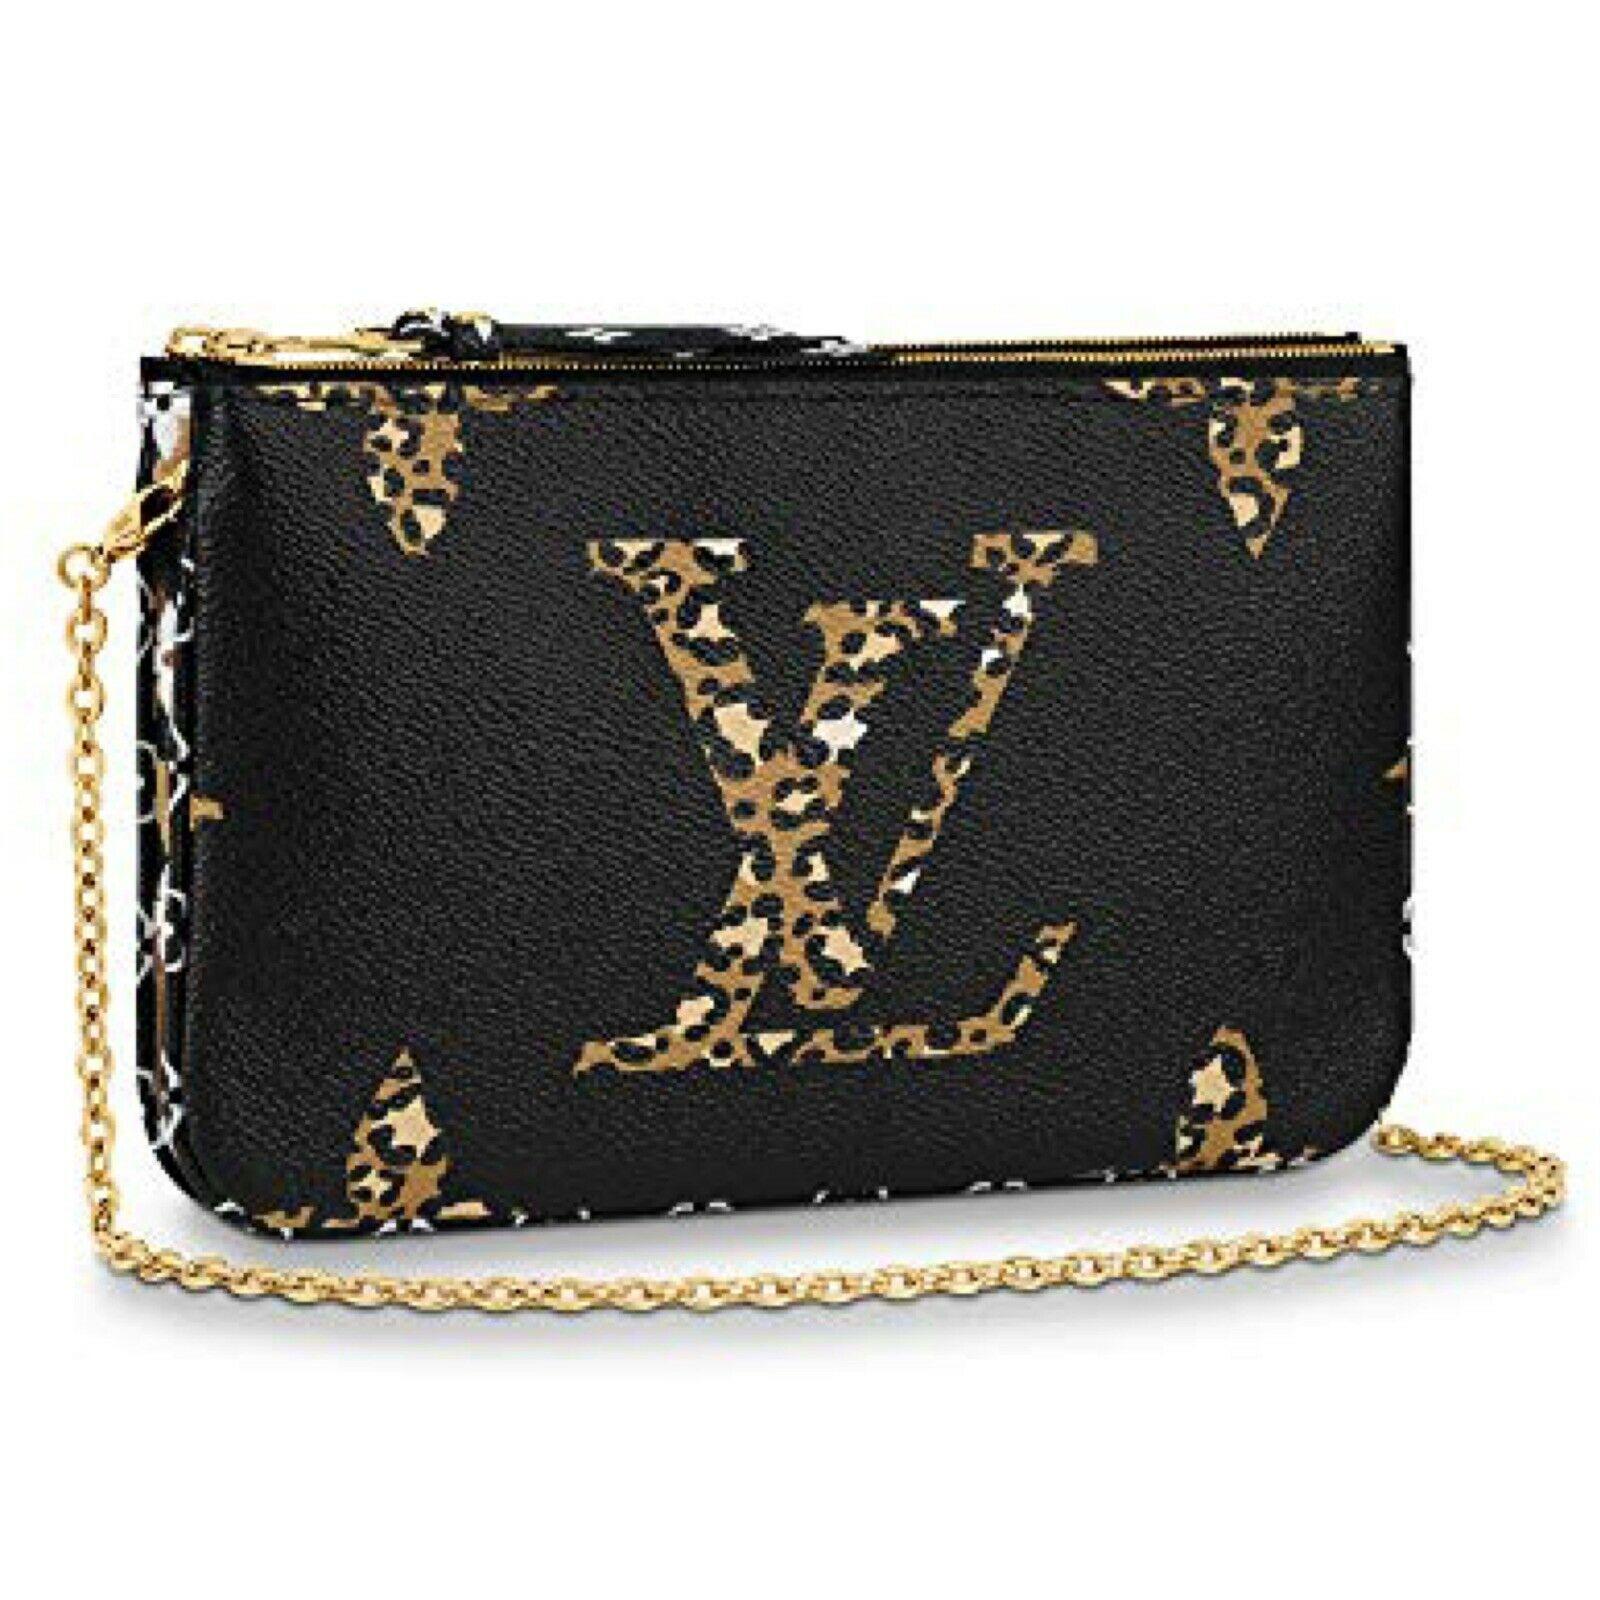 NEW Louis Vuitton Pochette Double Zip Black Jungle Giant Monogram Crossbody Bag